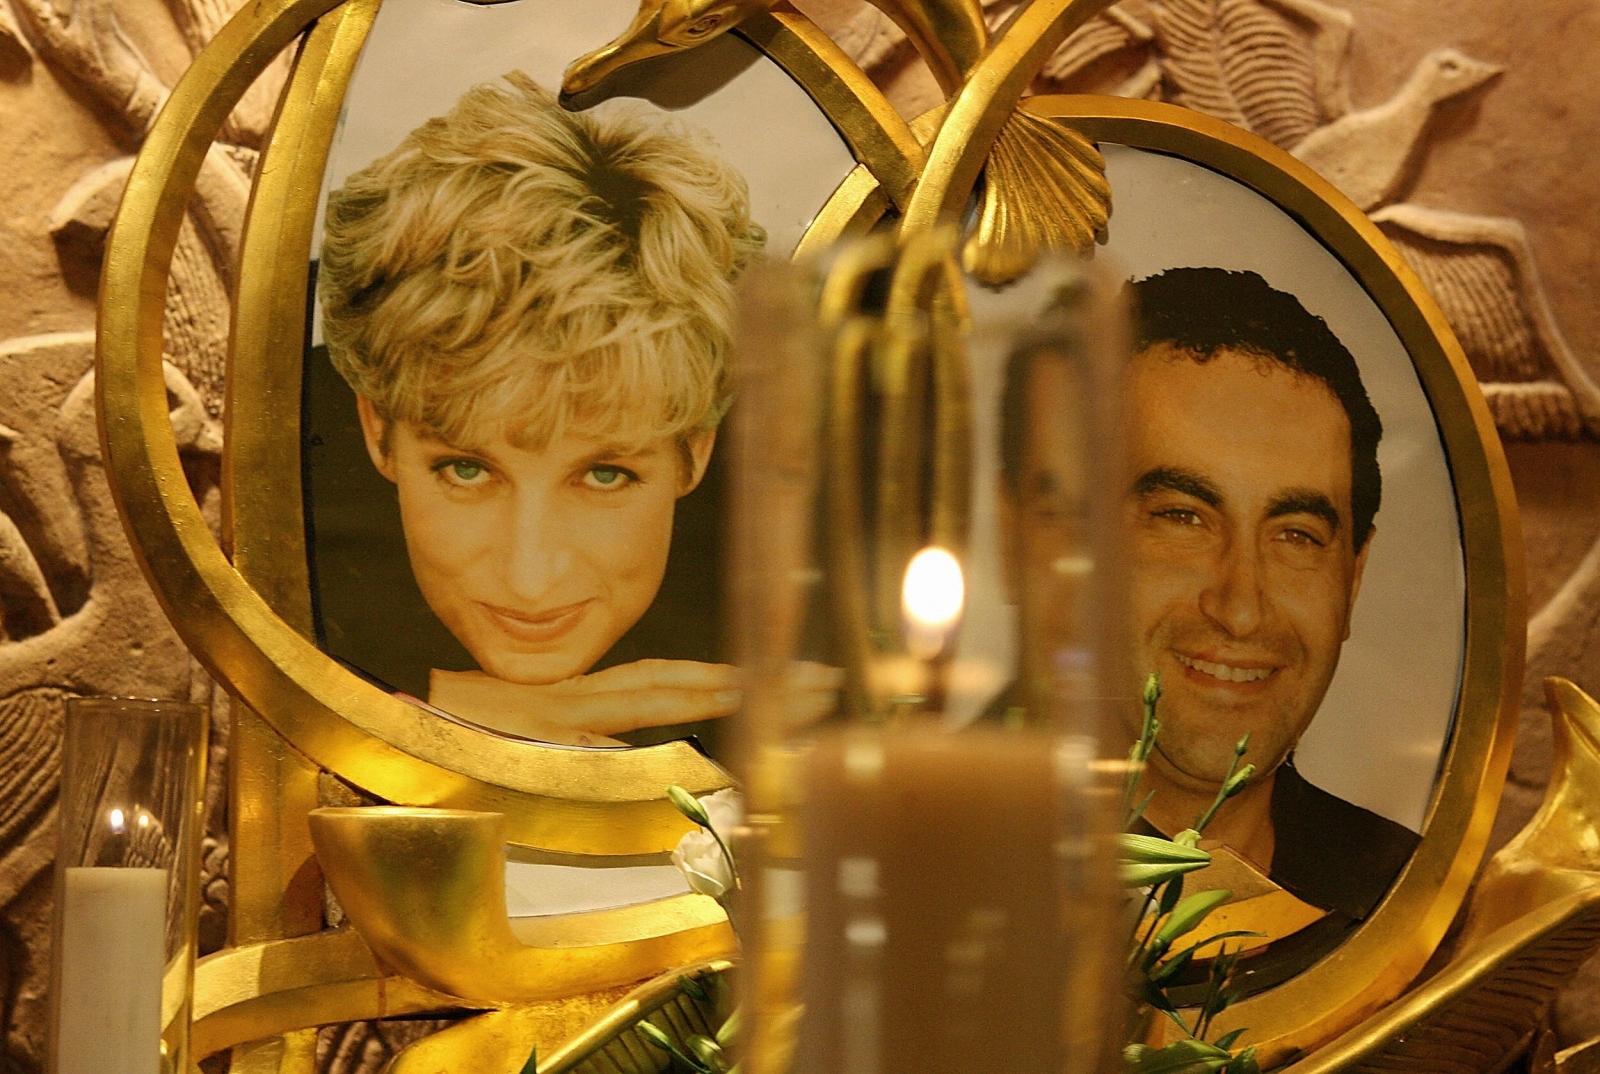 Diana, Princess of Wales and Dodi al-Fayed